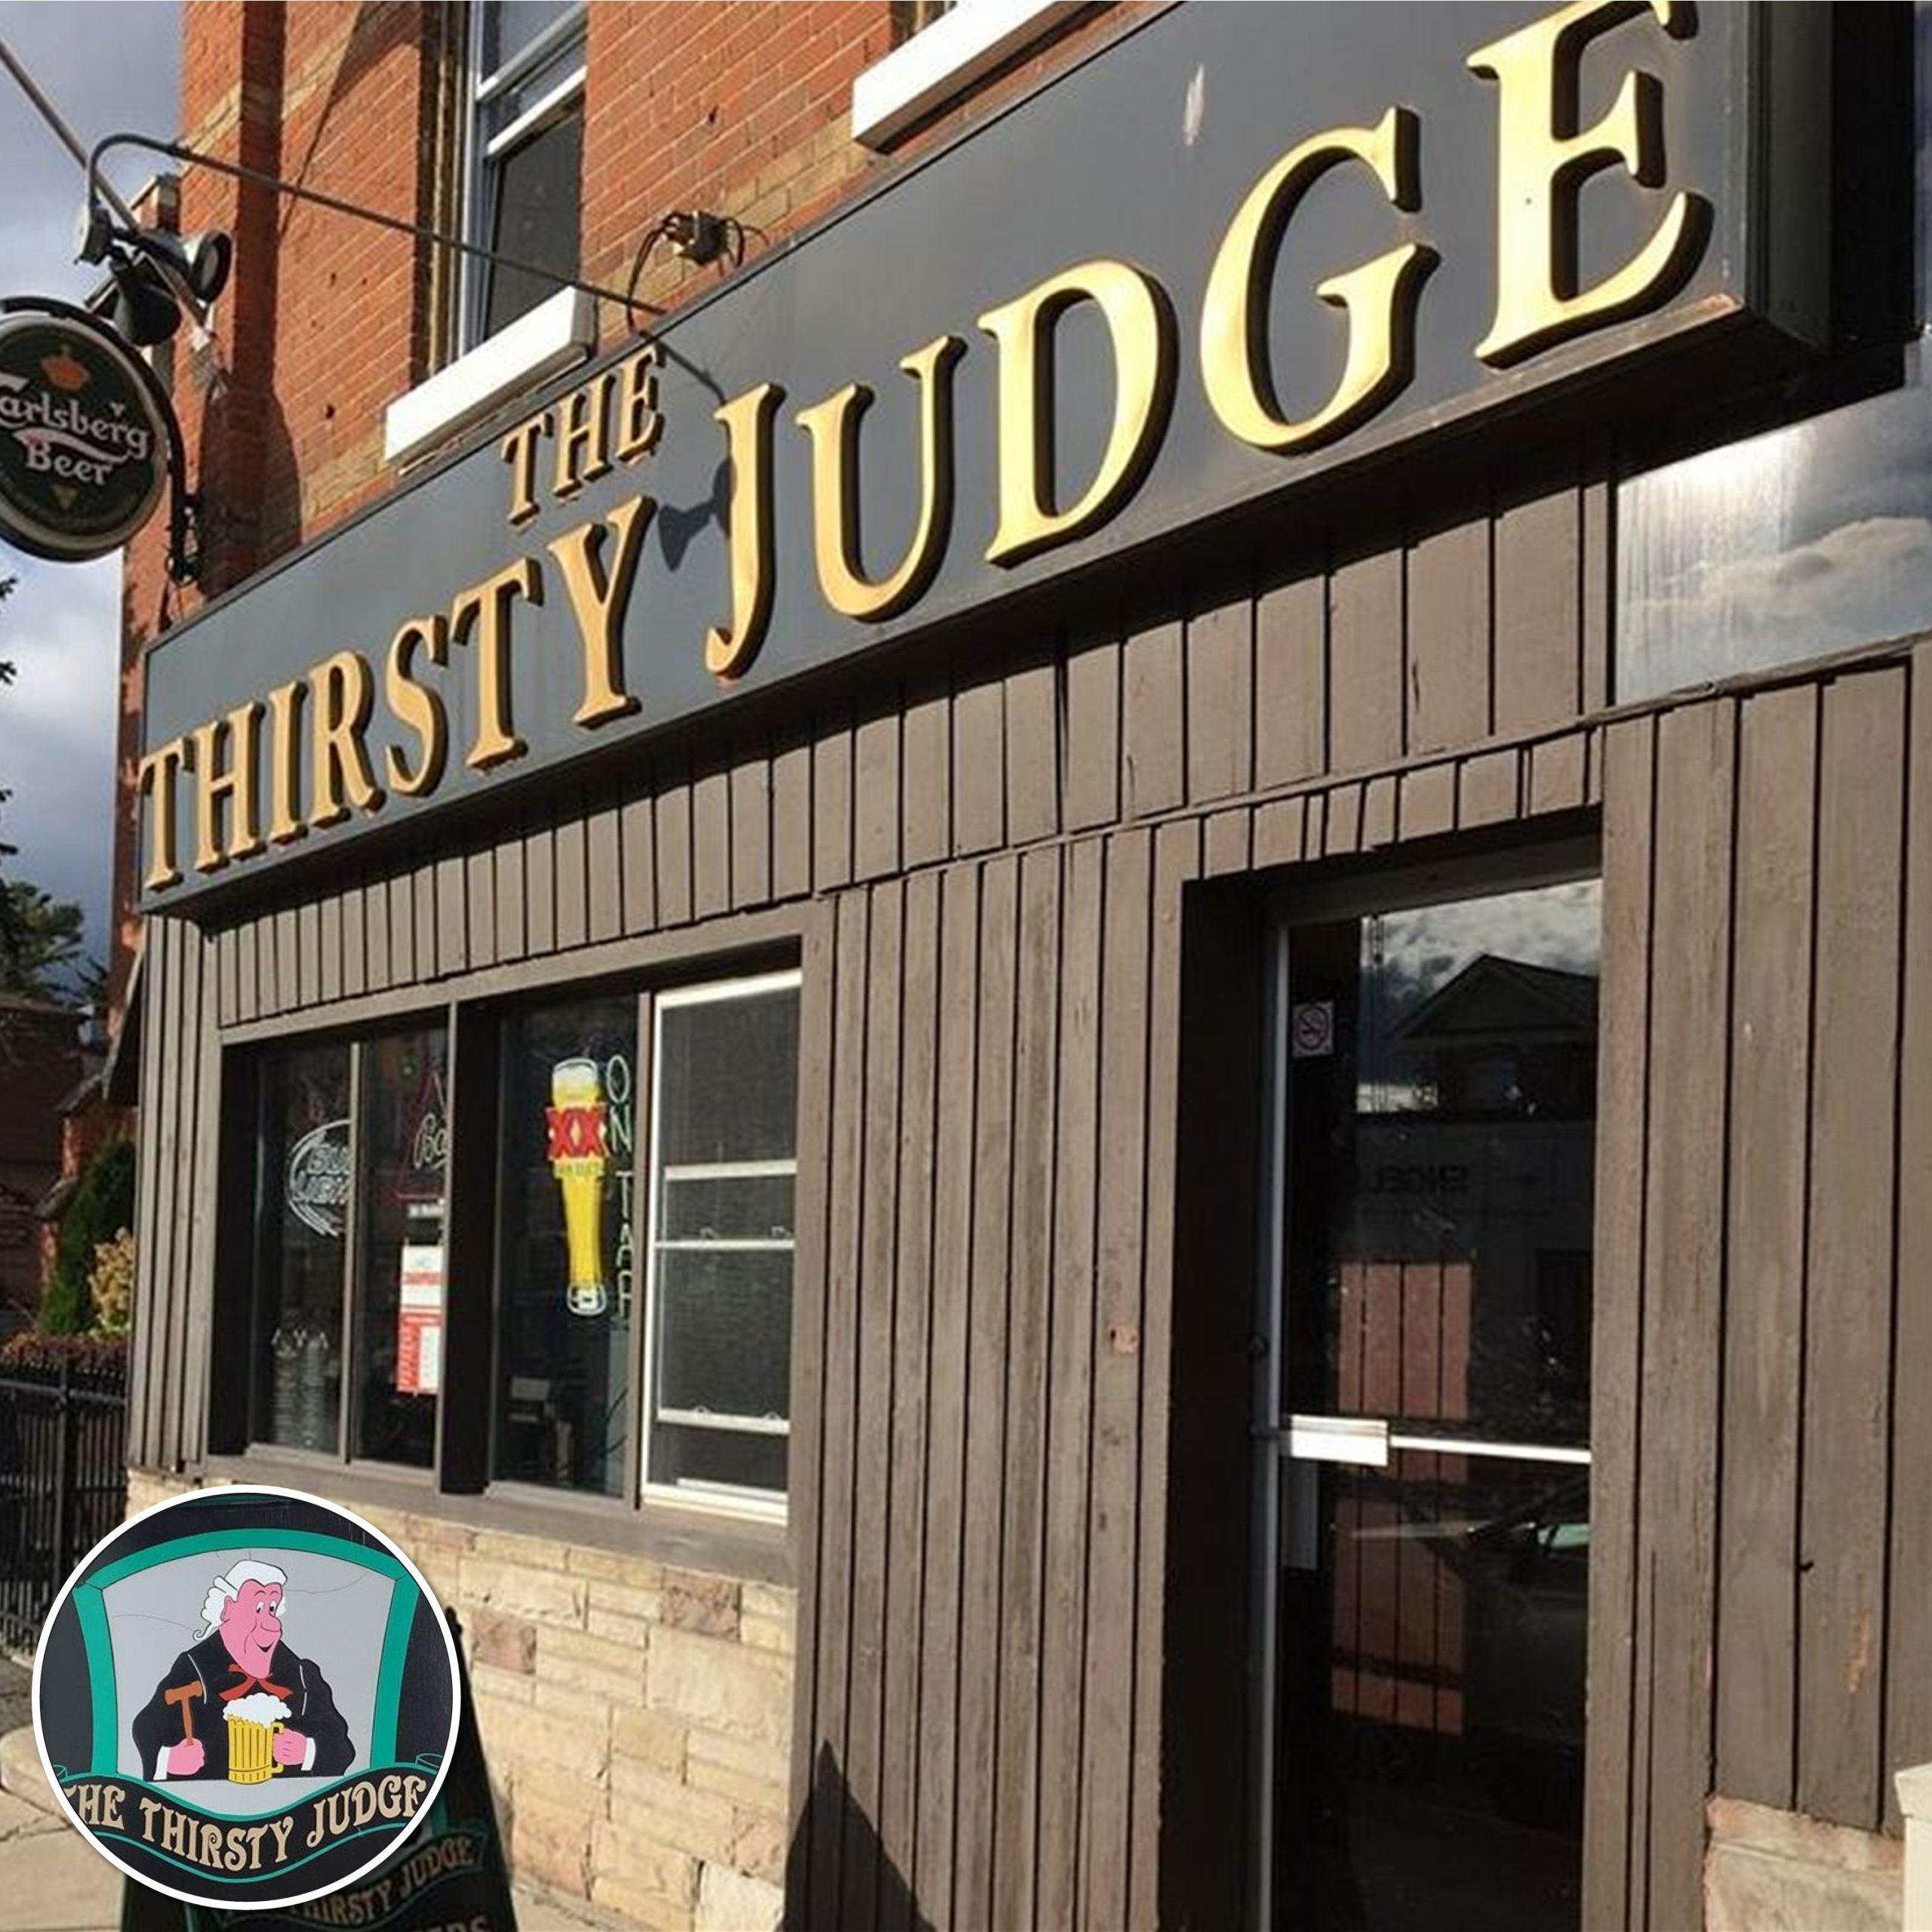 #MBWShoutOuts Week 27: The Thirsty Judge of Bracebridge